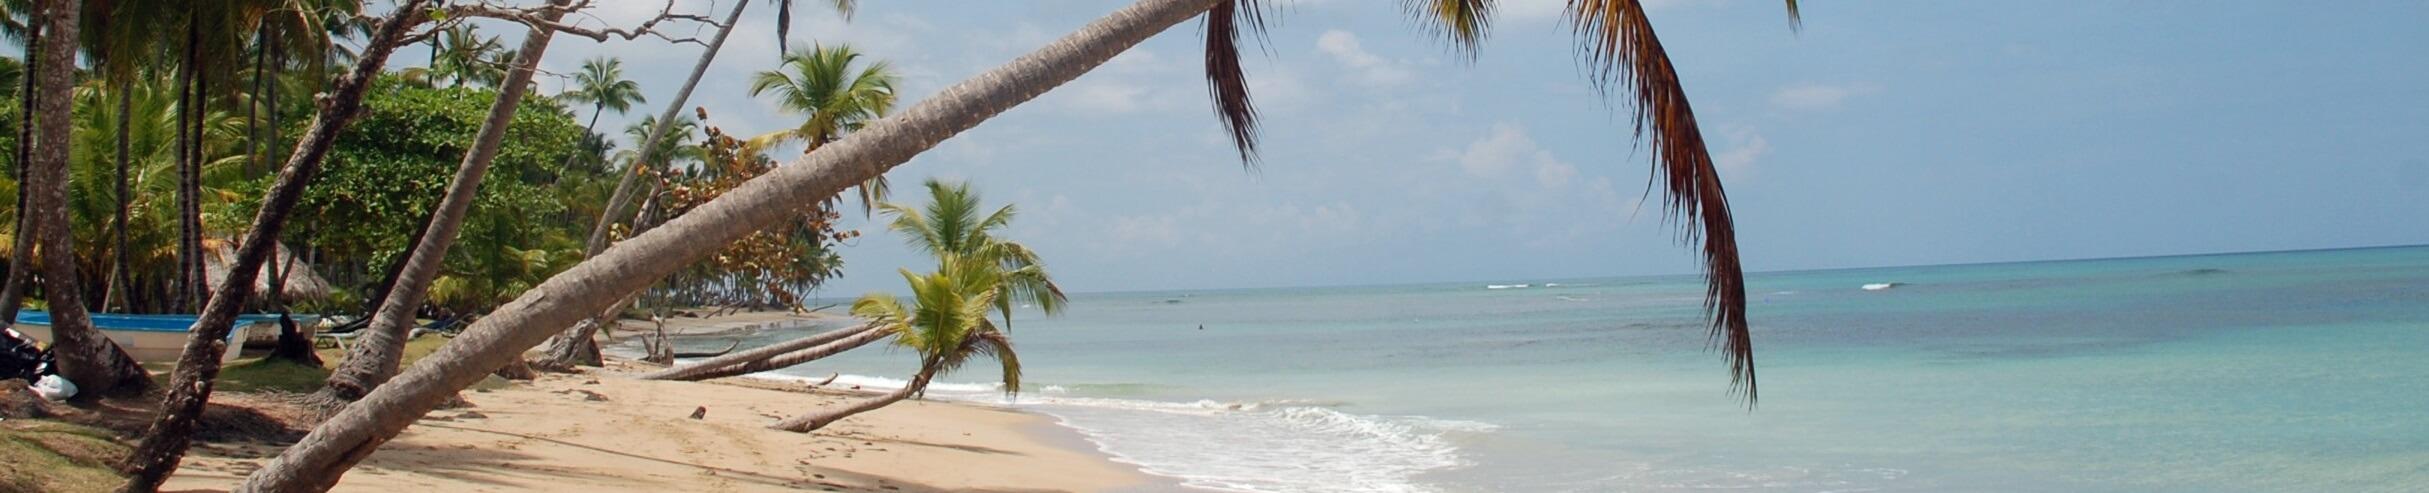 2nd best beaches in Dominican Republic-Playa Bonita